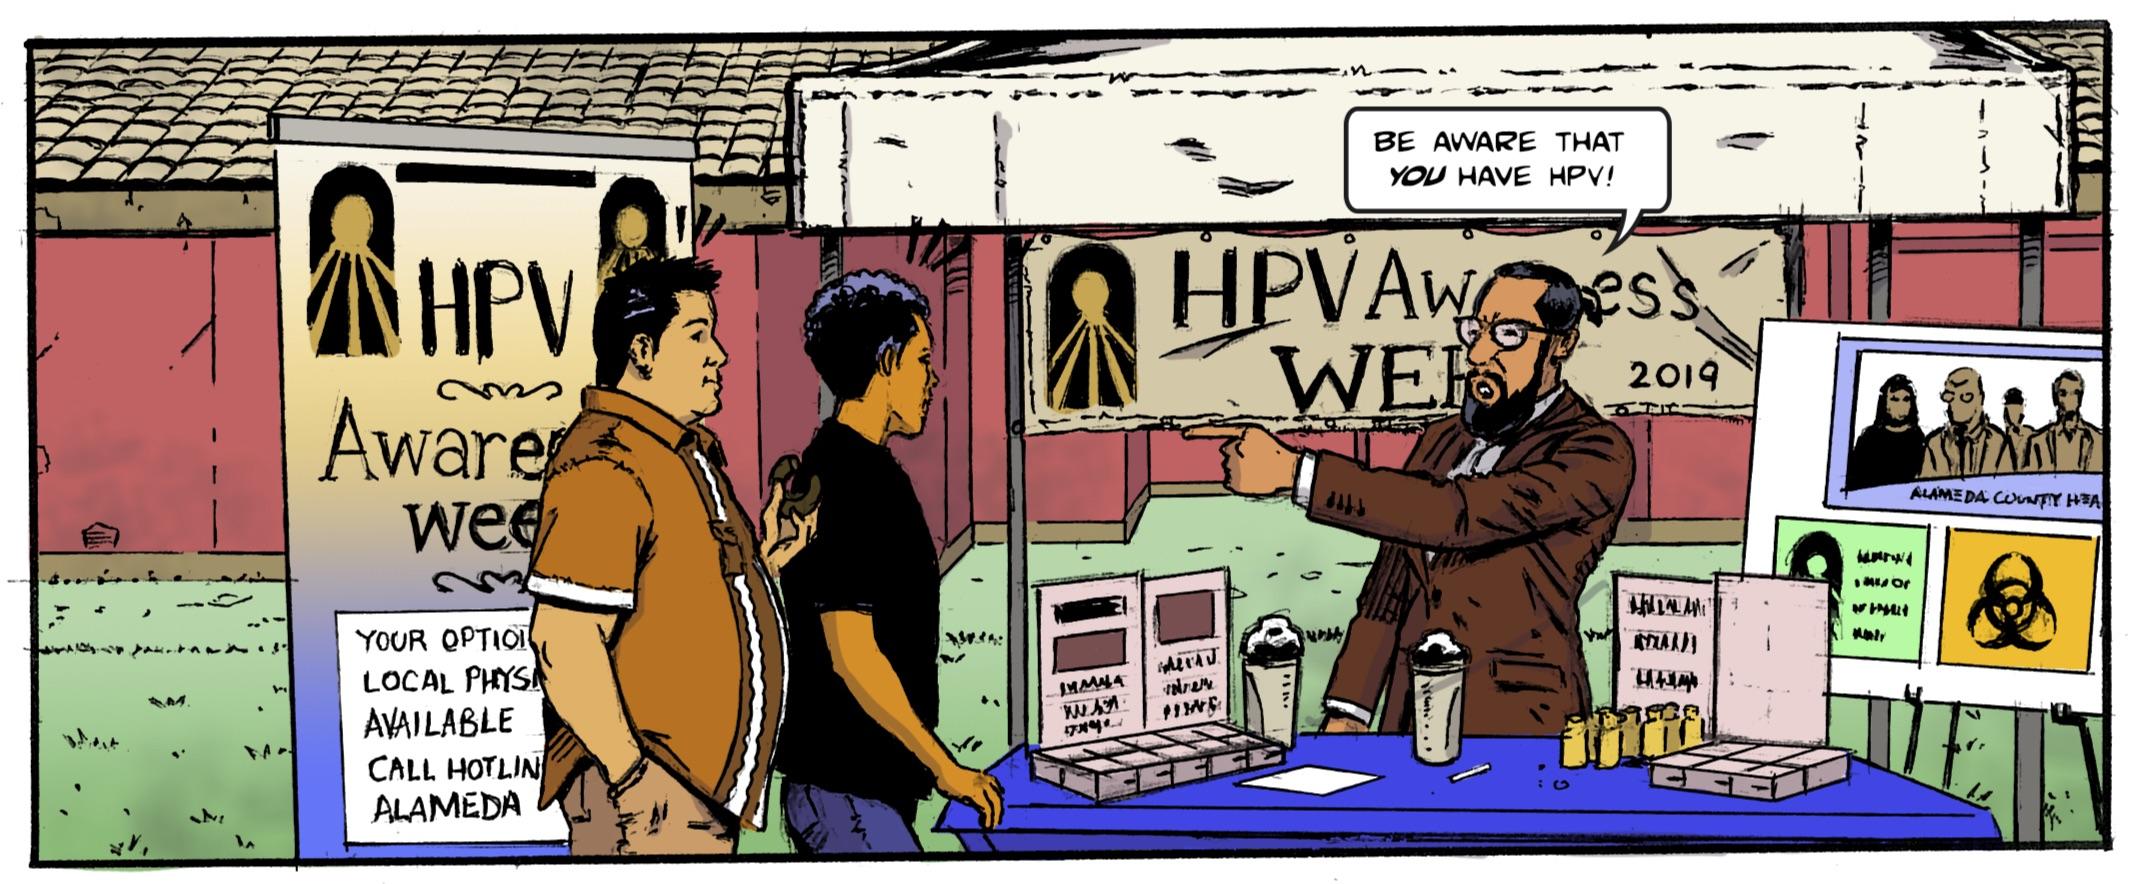 (H)af Comic Strip #94.jpg